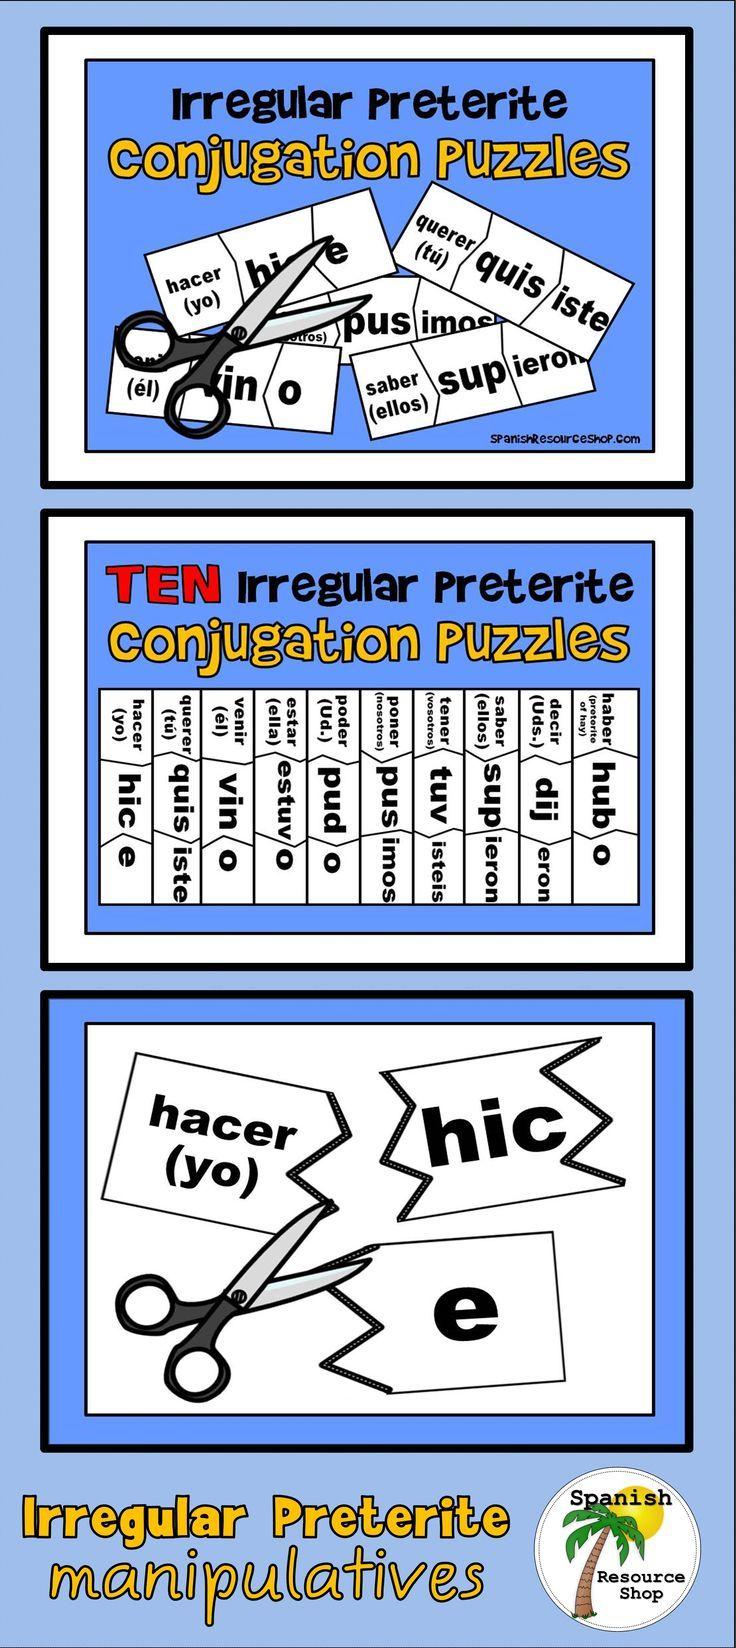 Fun Way To Practice The Spanish Irregular Preterite Verbs Irregular Preterite Preterite Spanish Classroom Activities [ 1648 x 736 Pixel ]